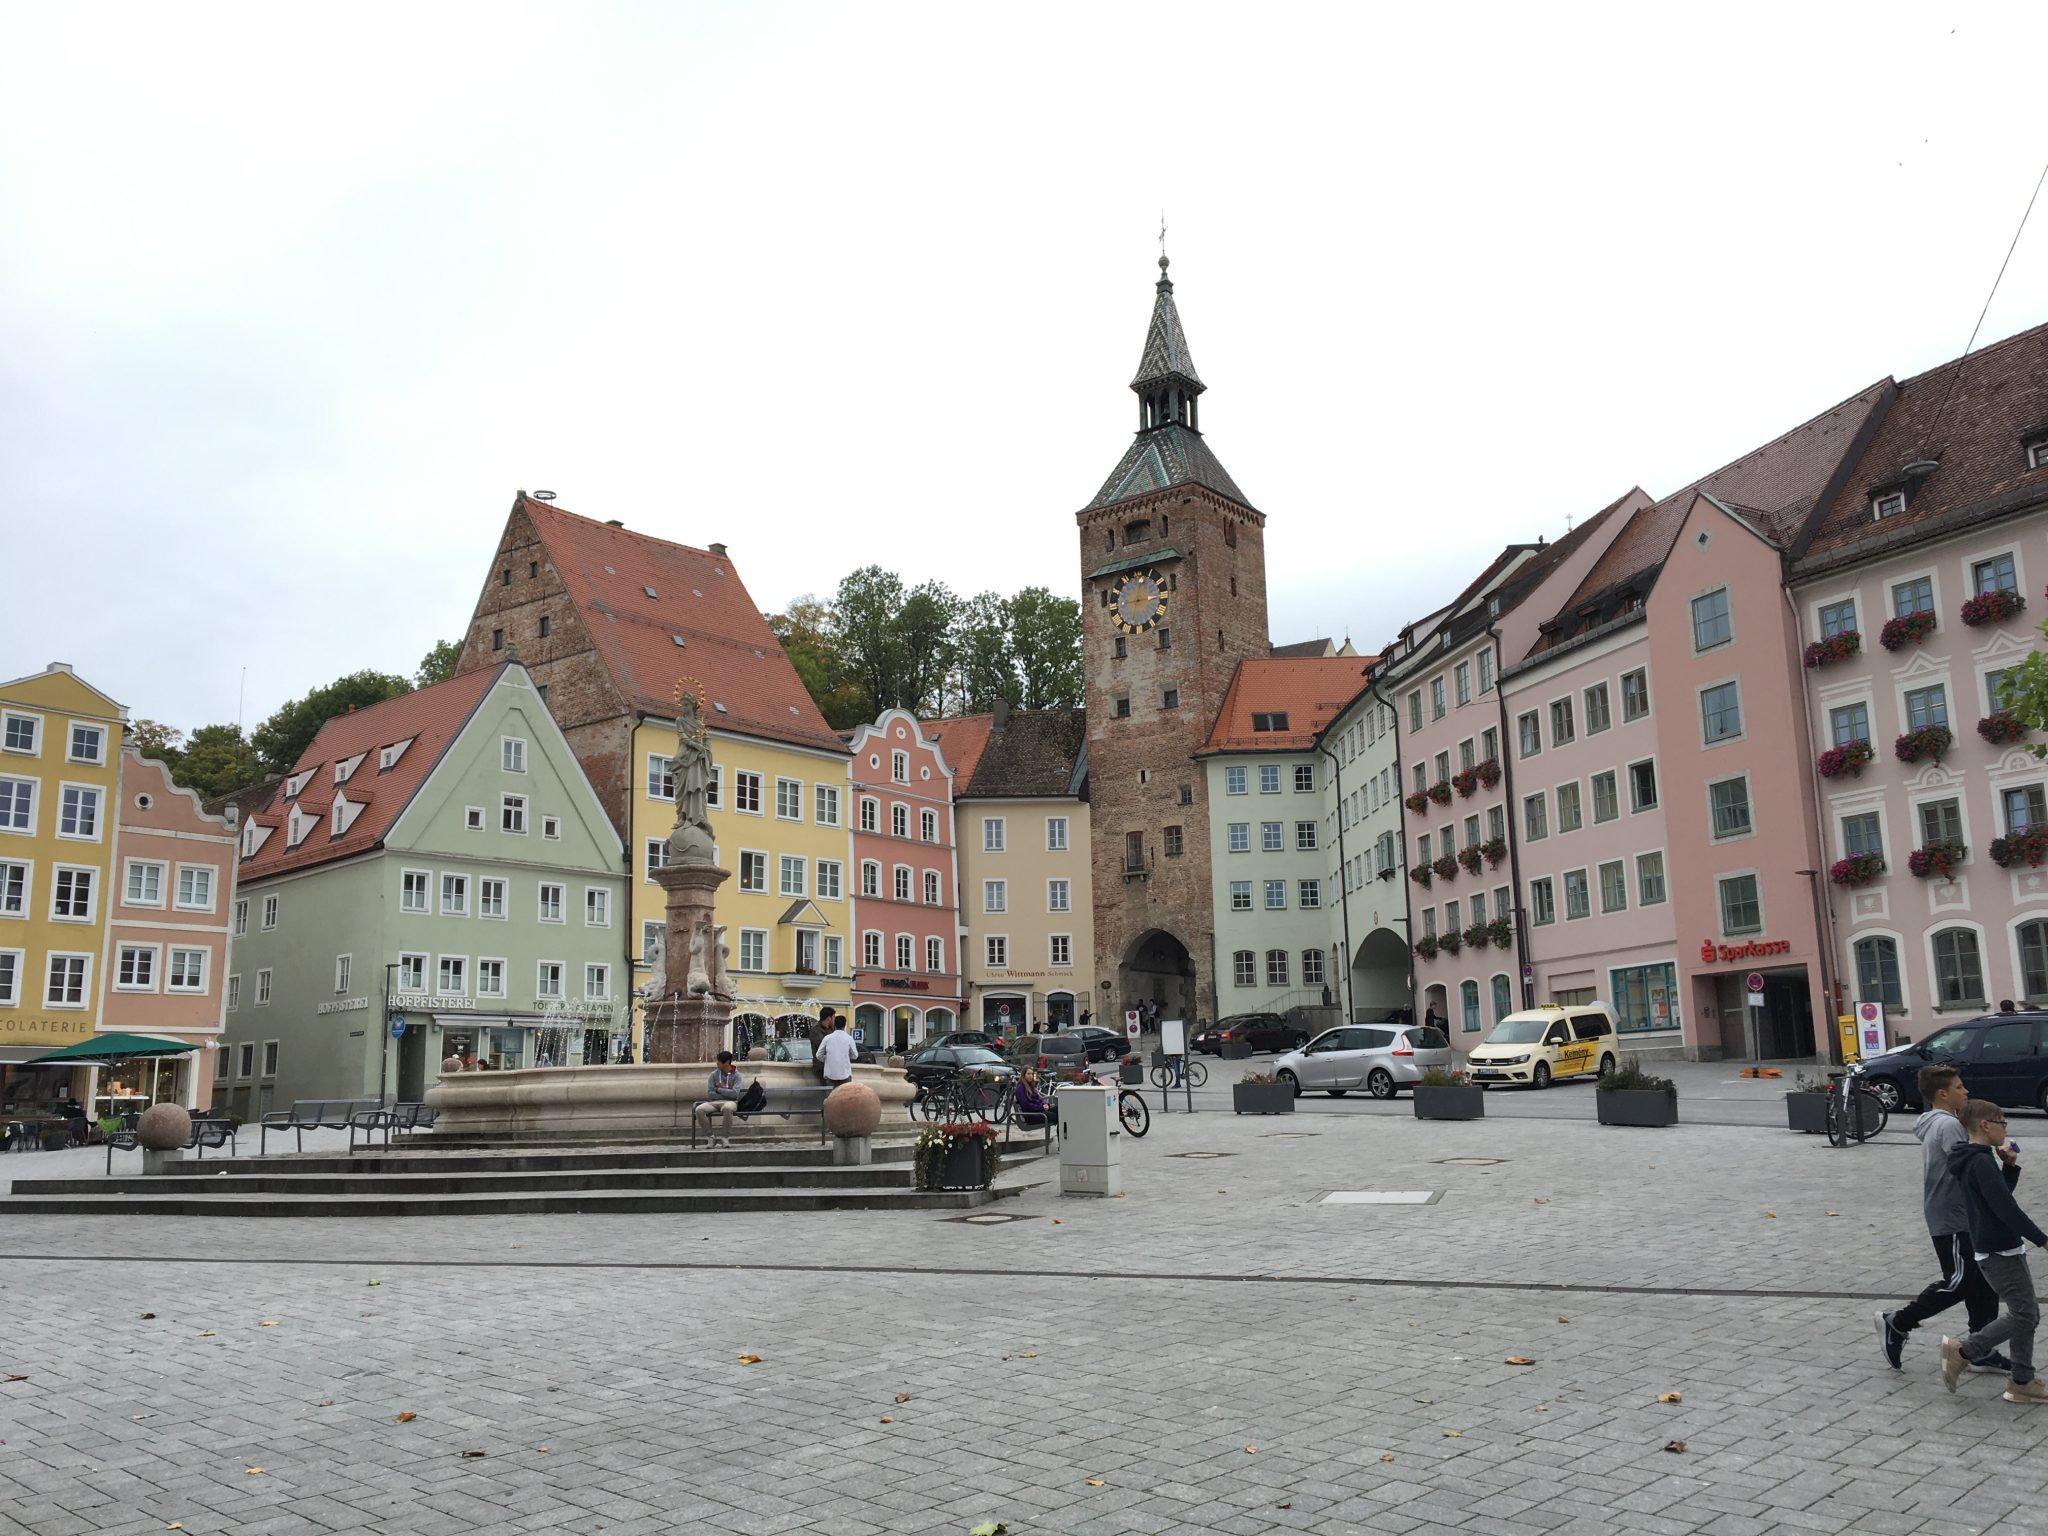 Market square Landsberg am Lech